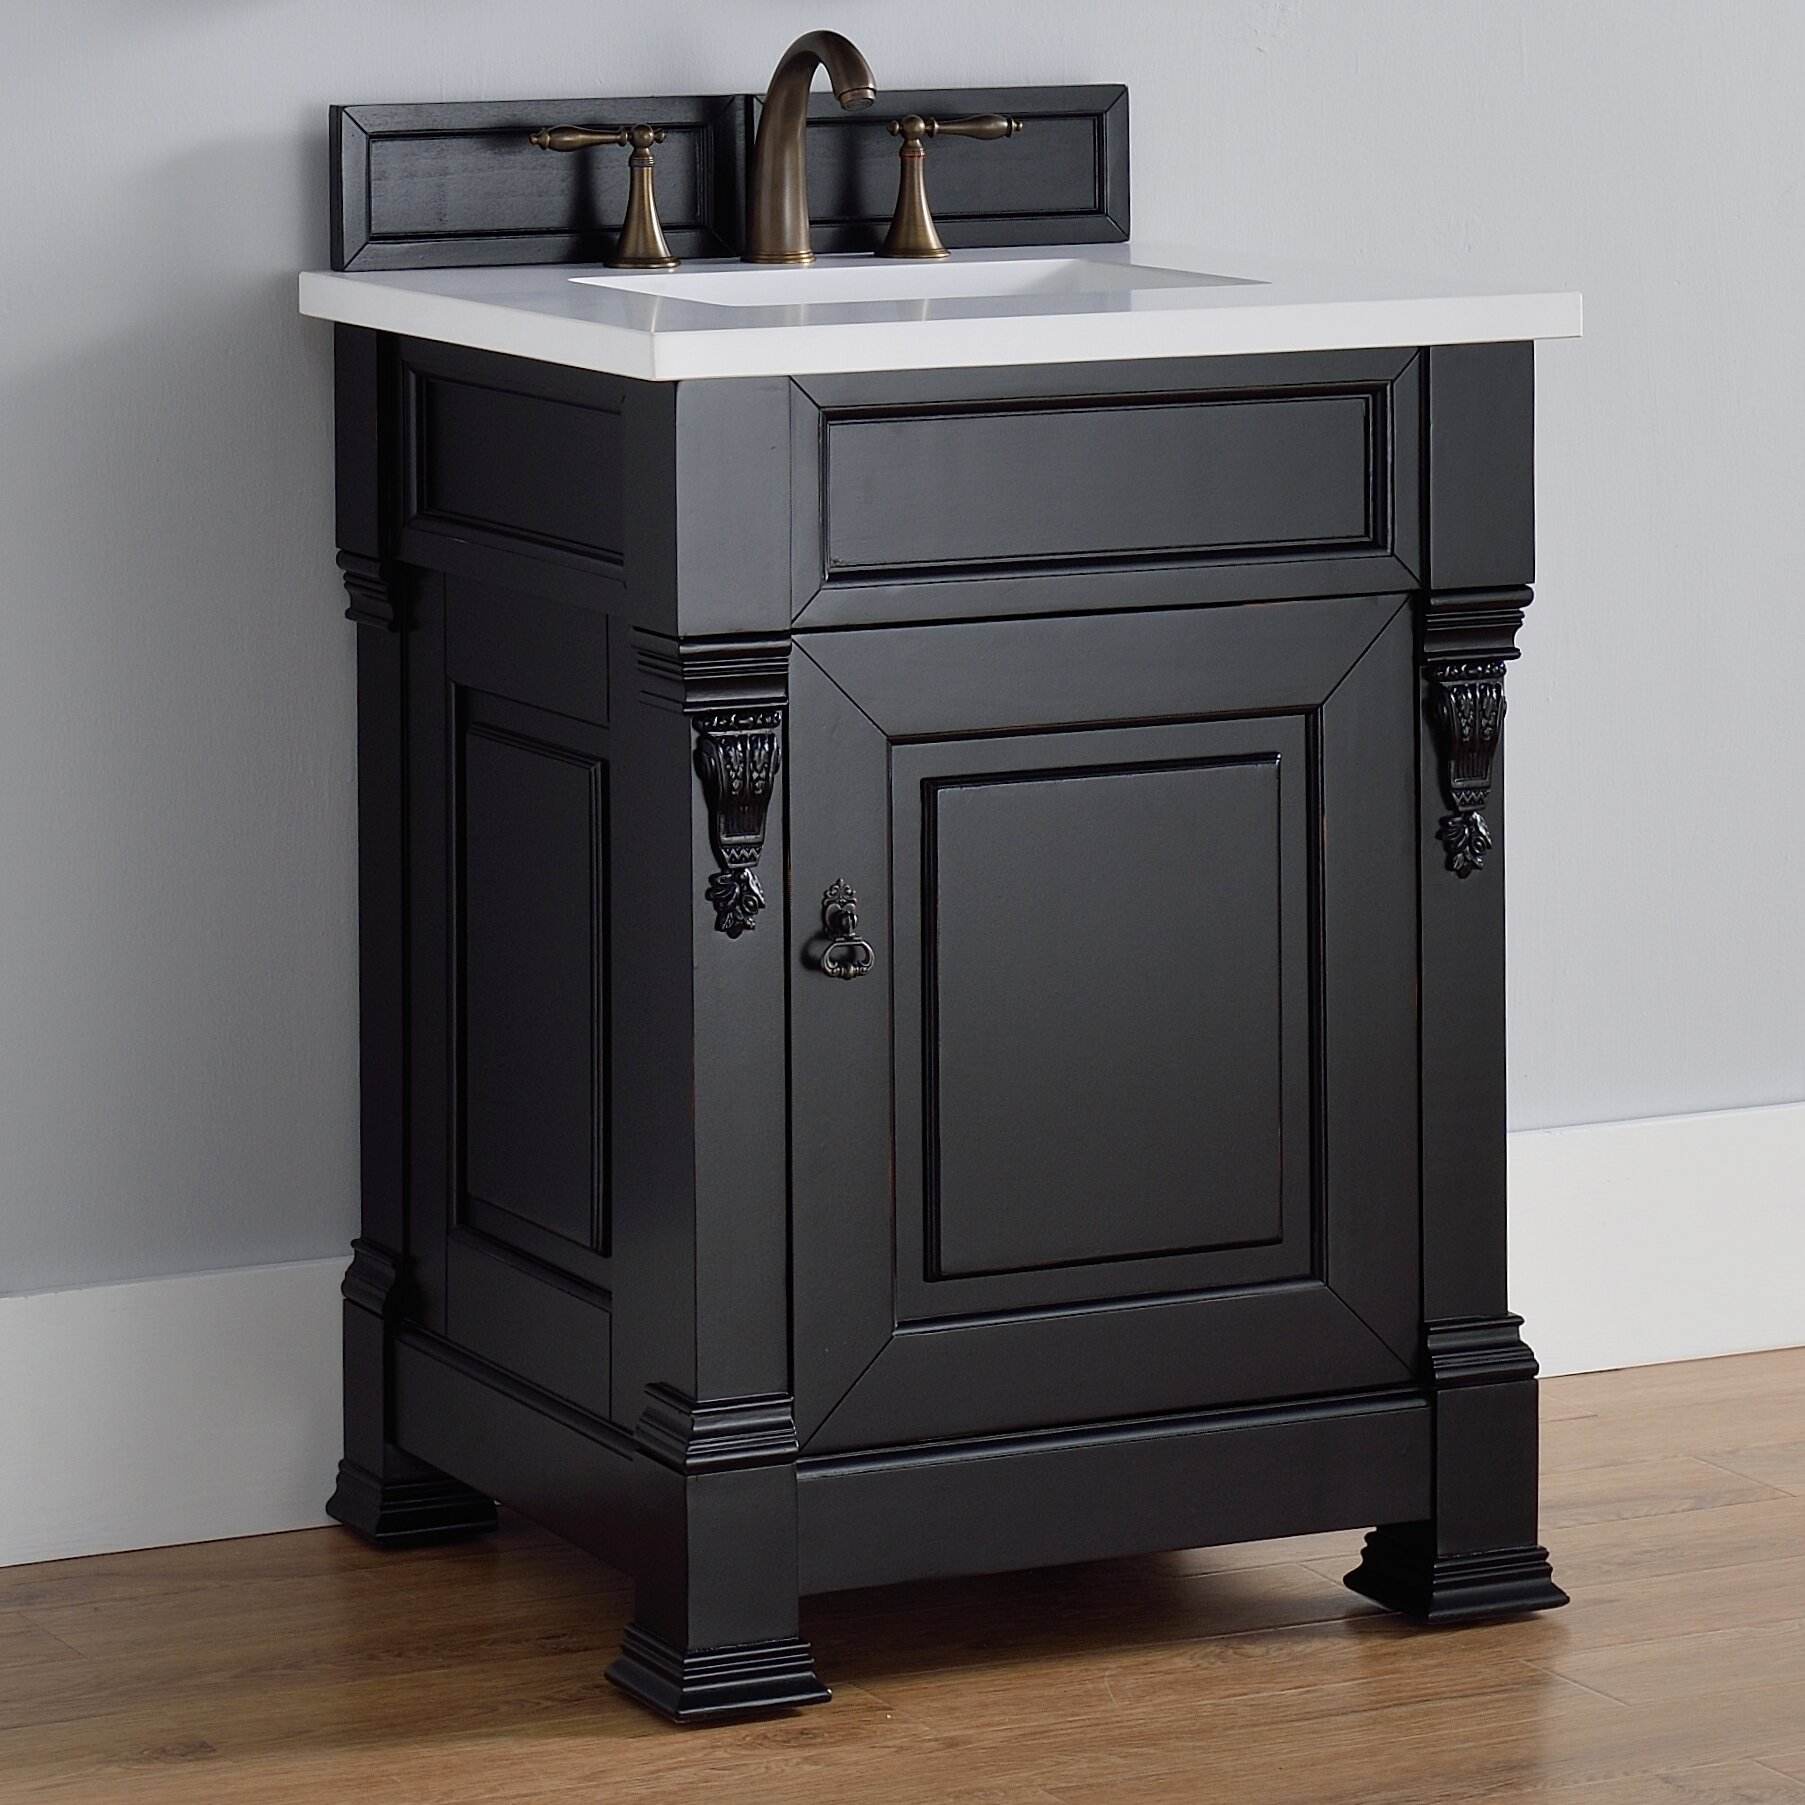 26 single antique black bathroom vanity set by james martin furniture